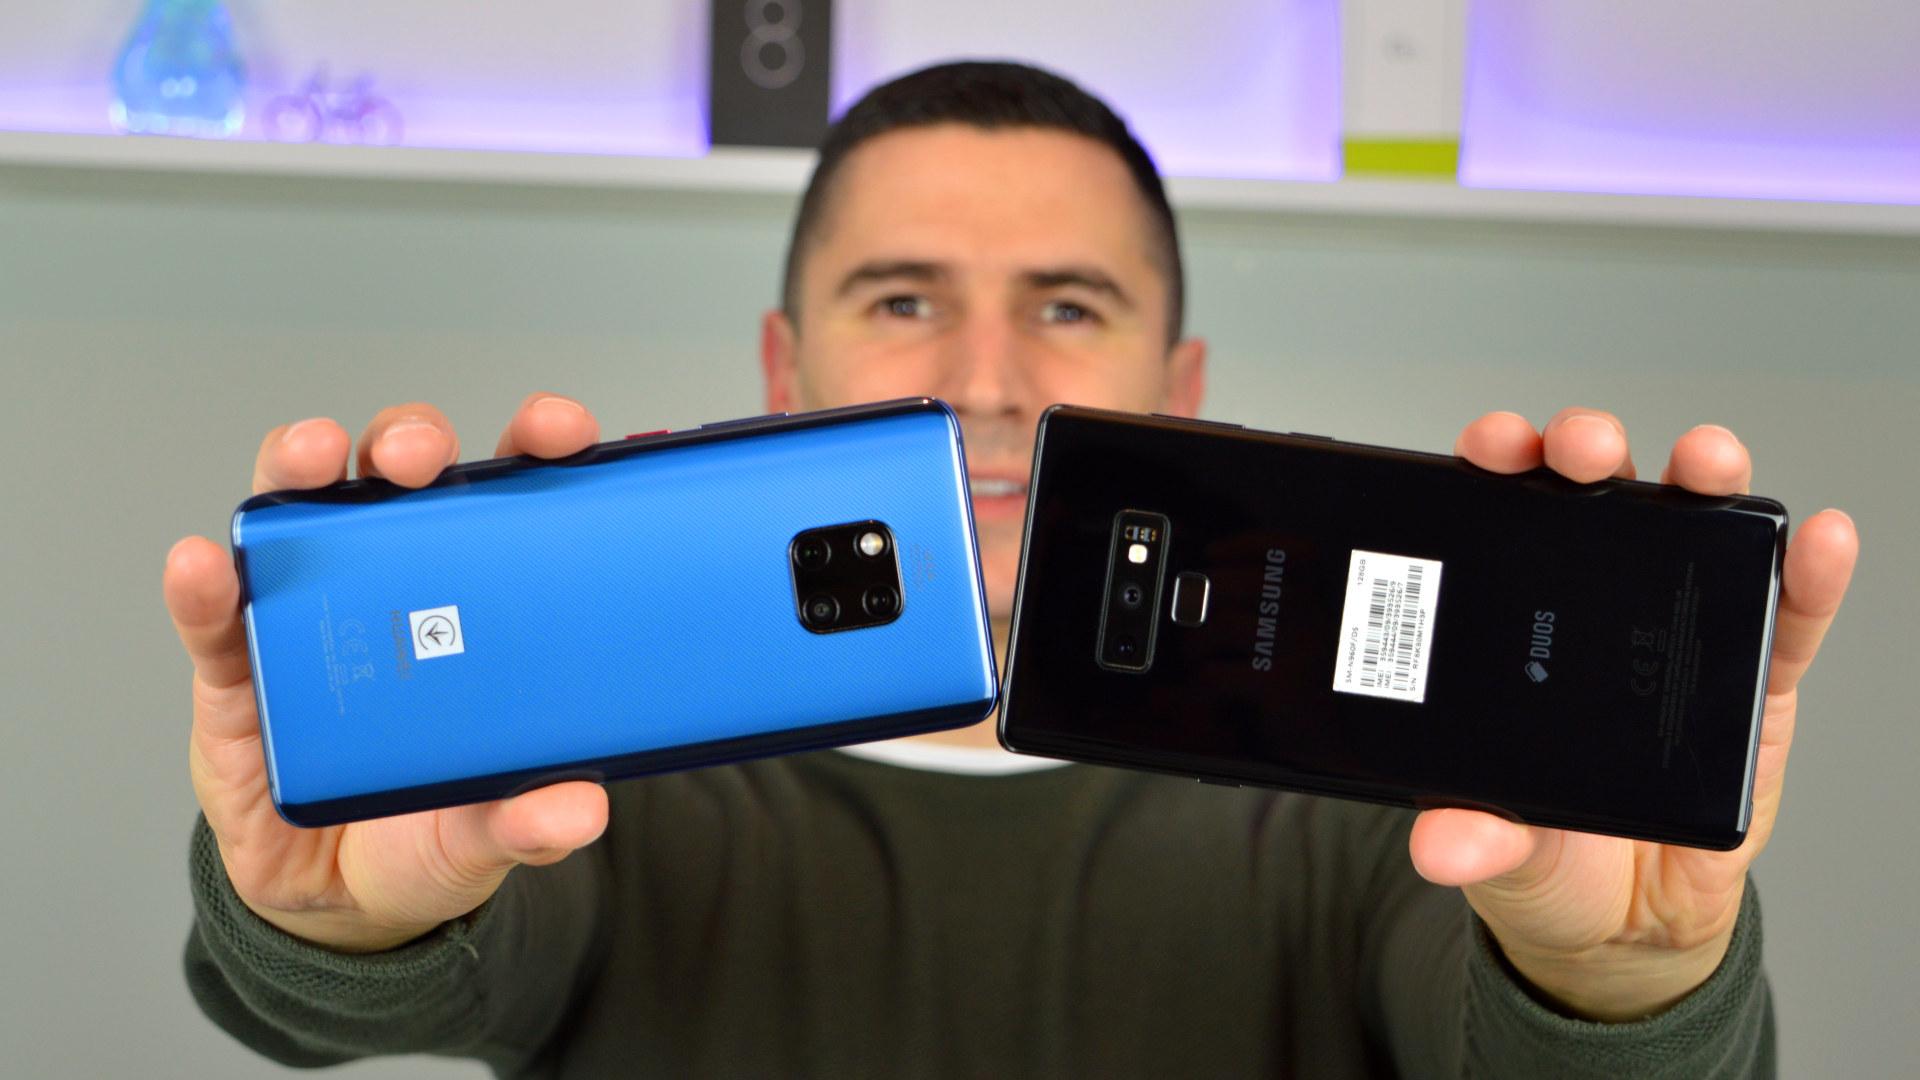 Huawei Mate 20 Pro vs Samsung Galaxy Note 9 usporedba kamera